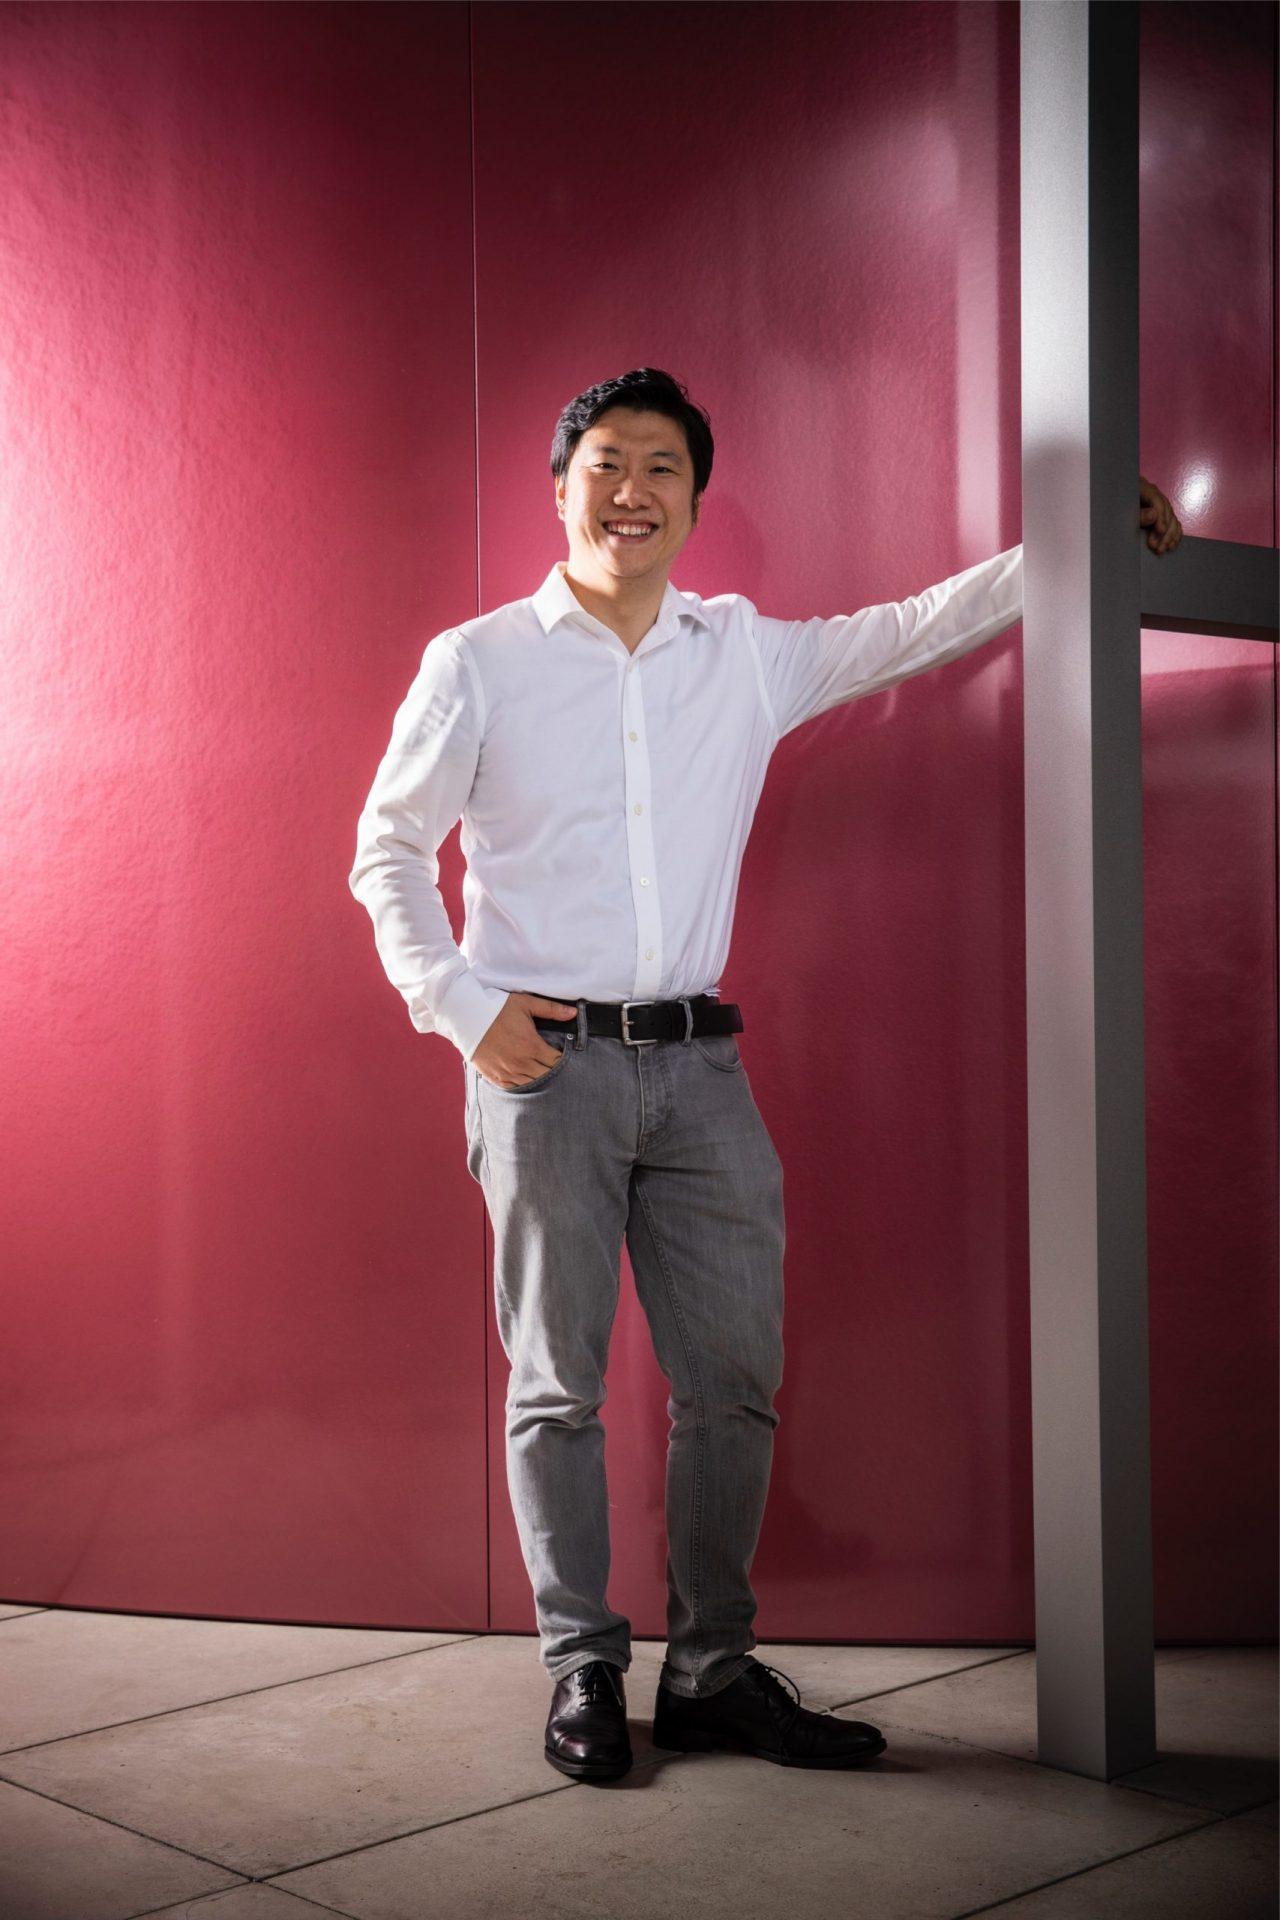 LONGHASH Japan代表 クリス・ダイ氏インタビューvol.5 分散型システムの応用性【フィスコ 株・企業報】